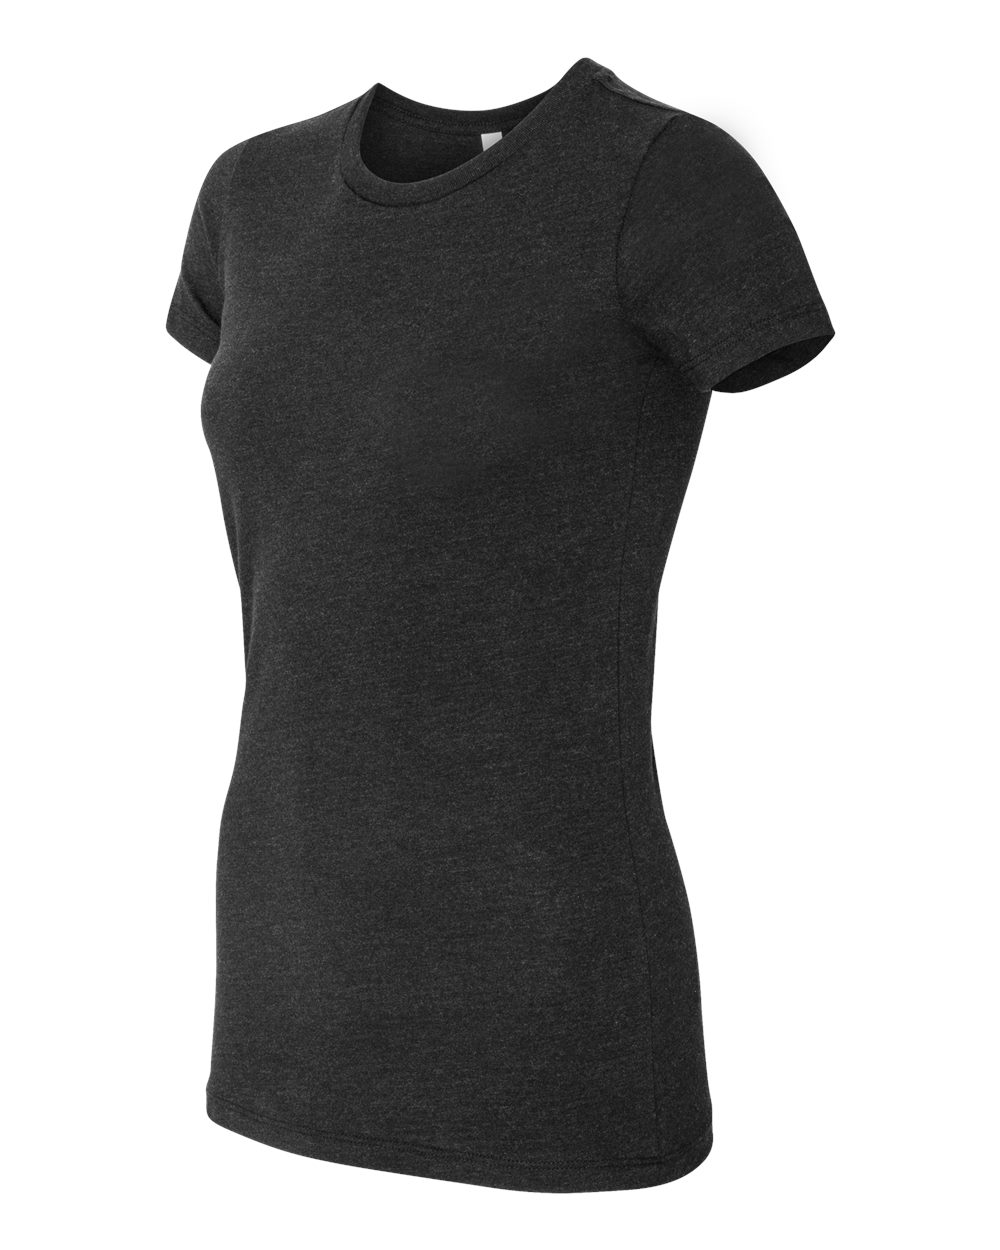 Bella-Canvas-Women-039-s-Favorite-T-Shirt-6004-S-2XL thumbnail 150